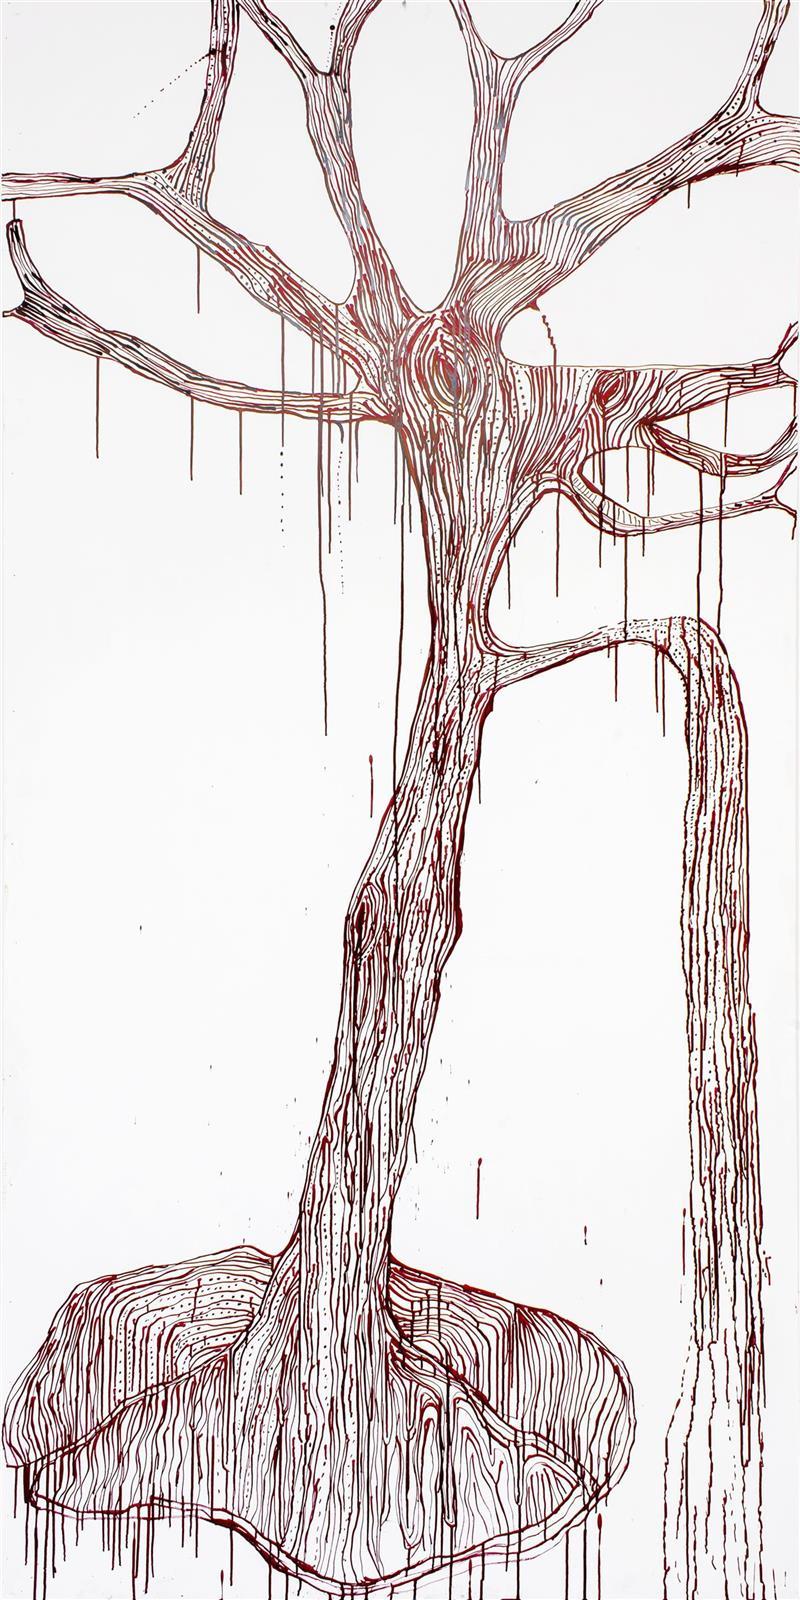 Crying Tree, 2020